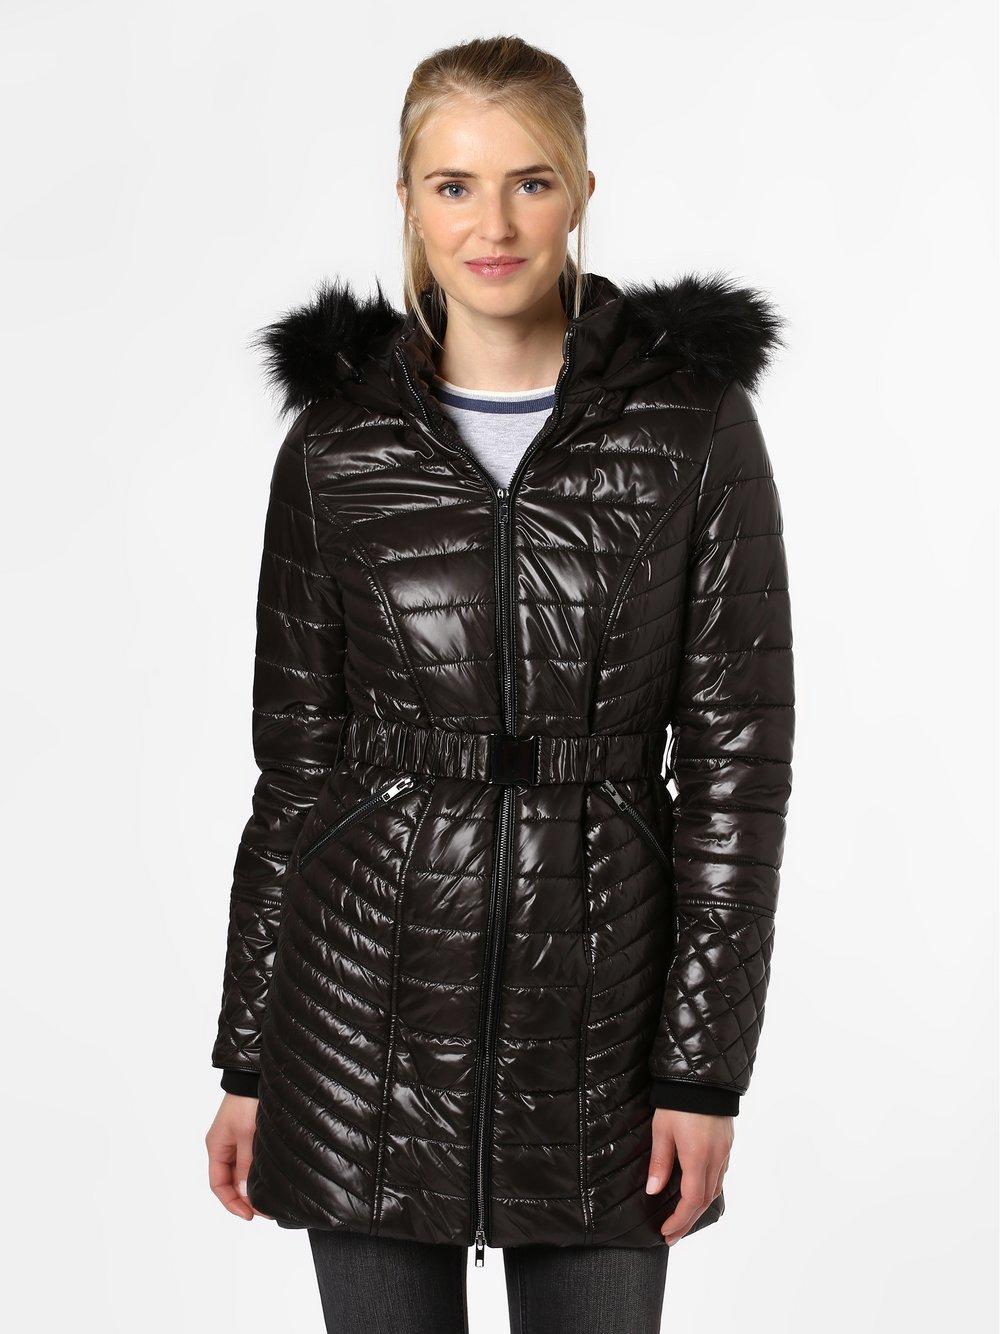 VG – Damski płaszcz pikowany, czarny Van Graaf 443534-0001-00380